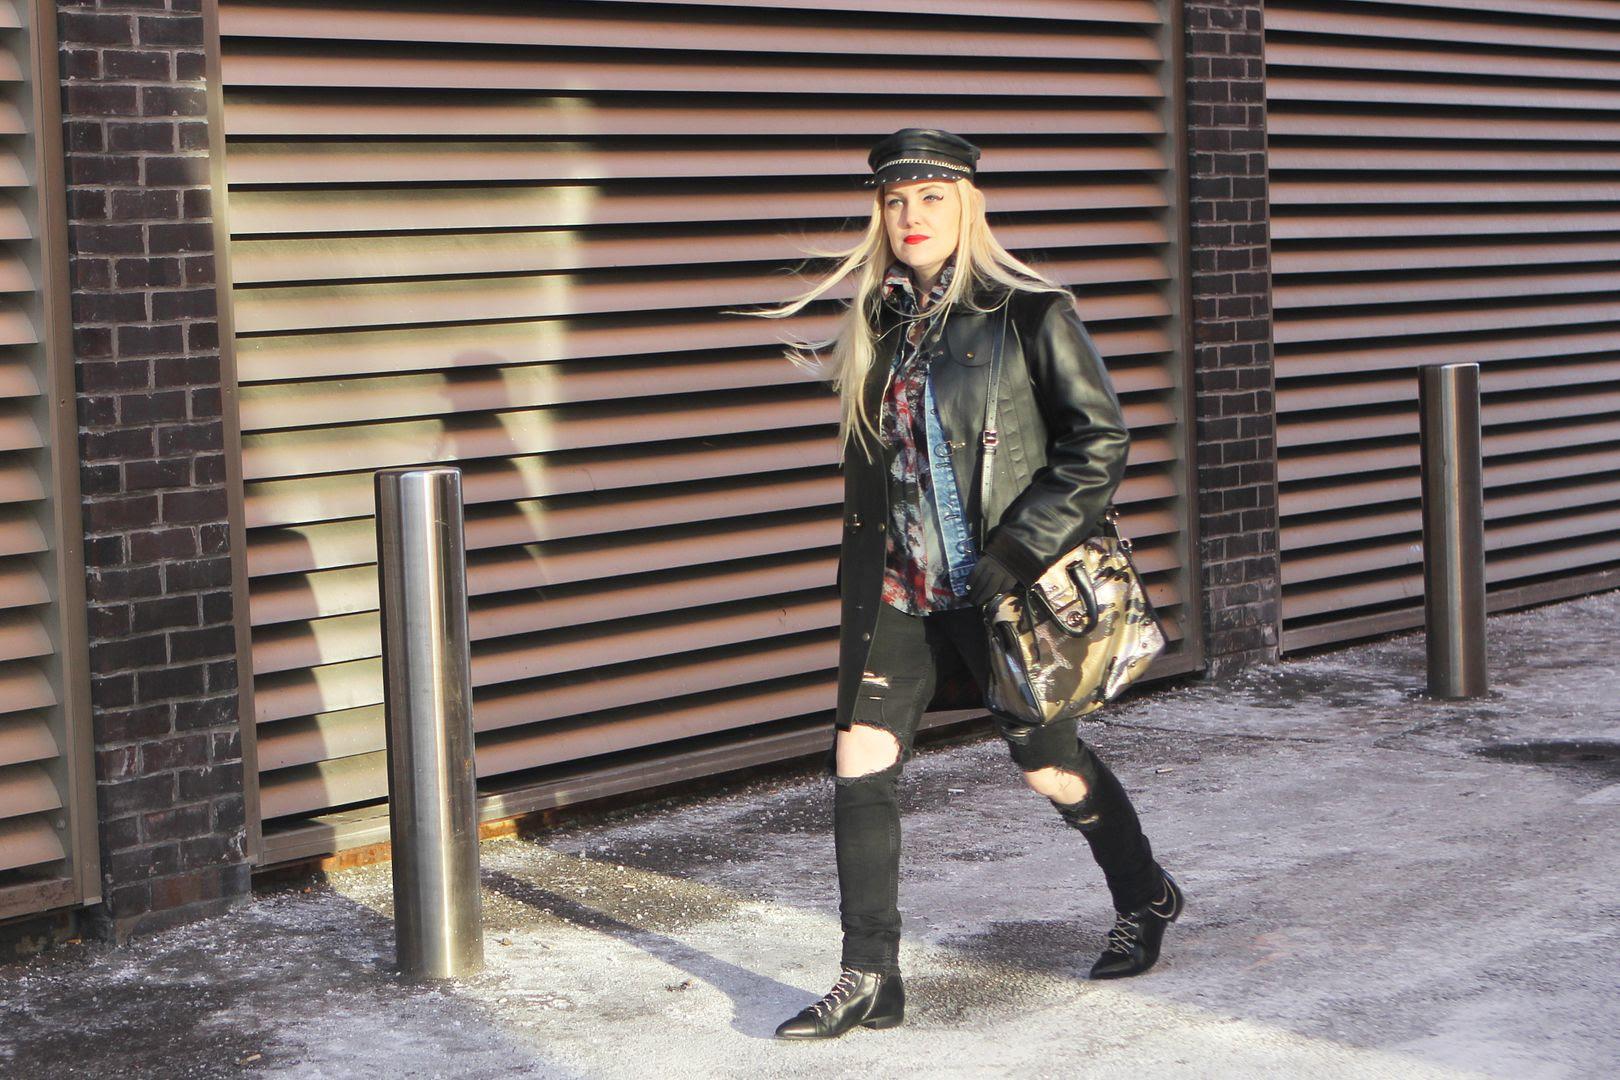 photo sambeckerman-fashion-blogger-street-style-leathercoach-rhyder-camouflage-numberoneblogincanada-fashion_zpsfa7699b4.jpg